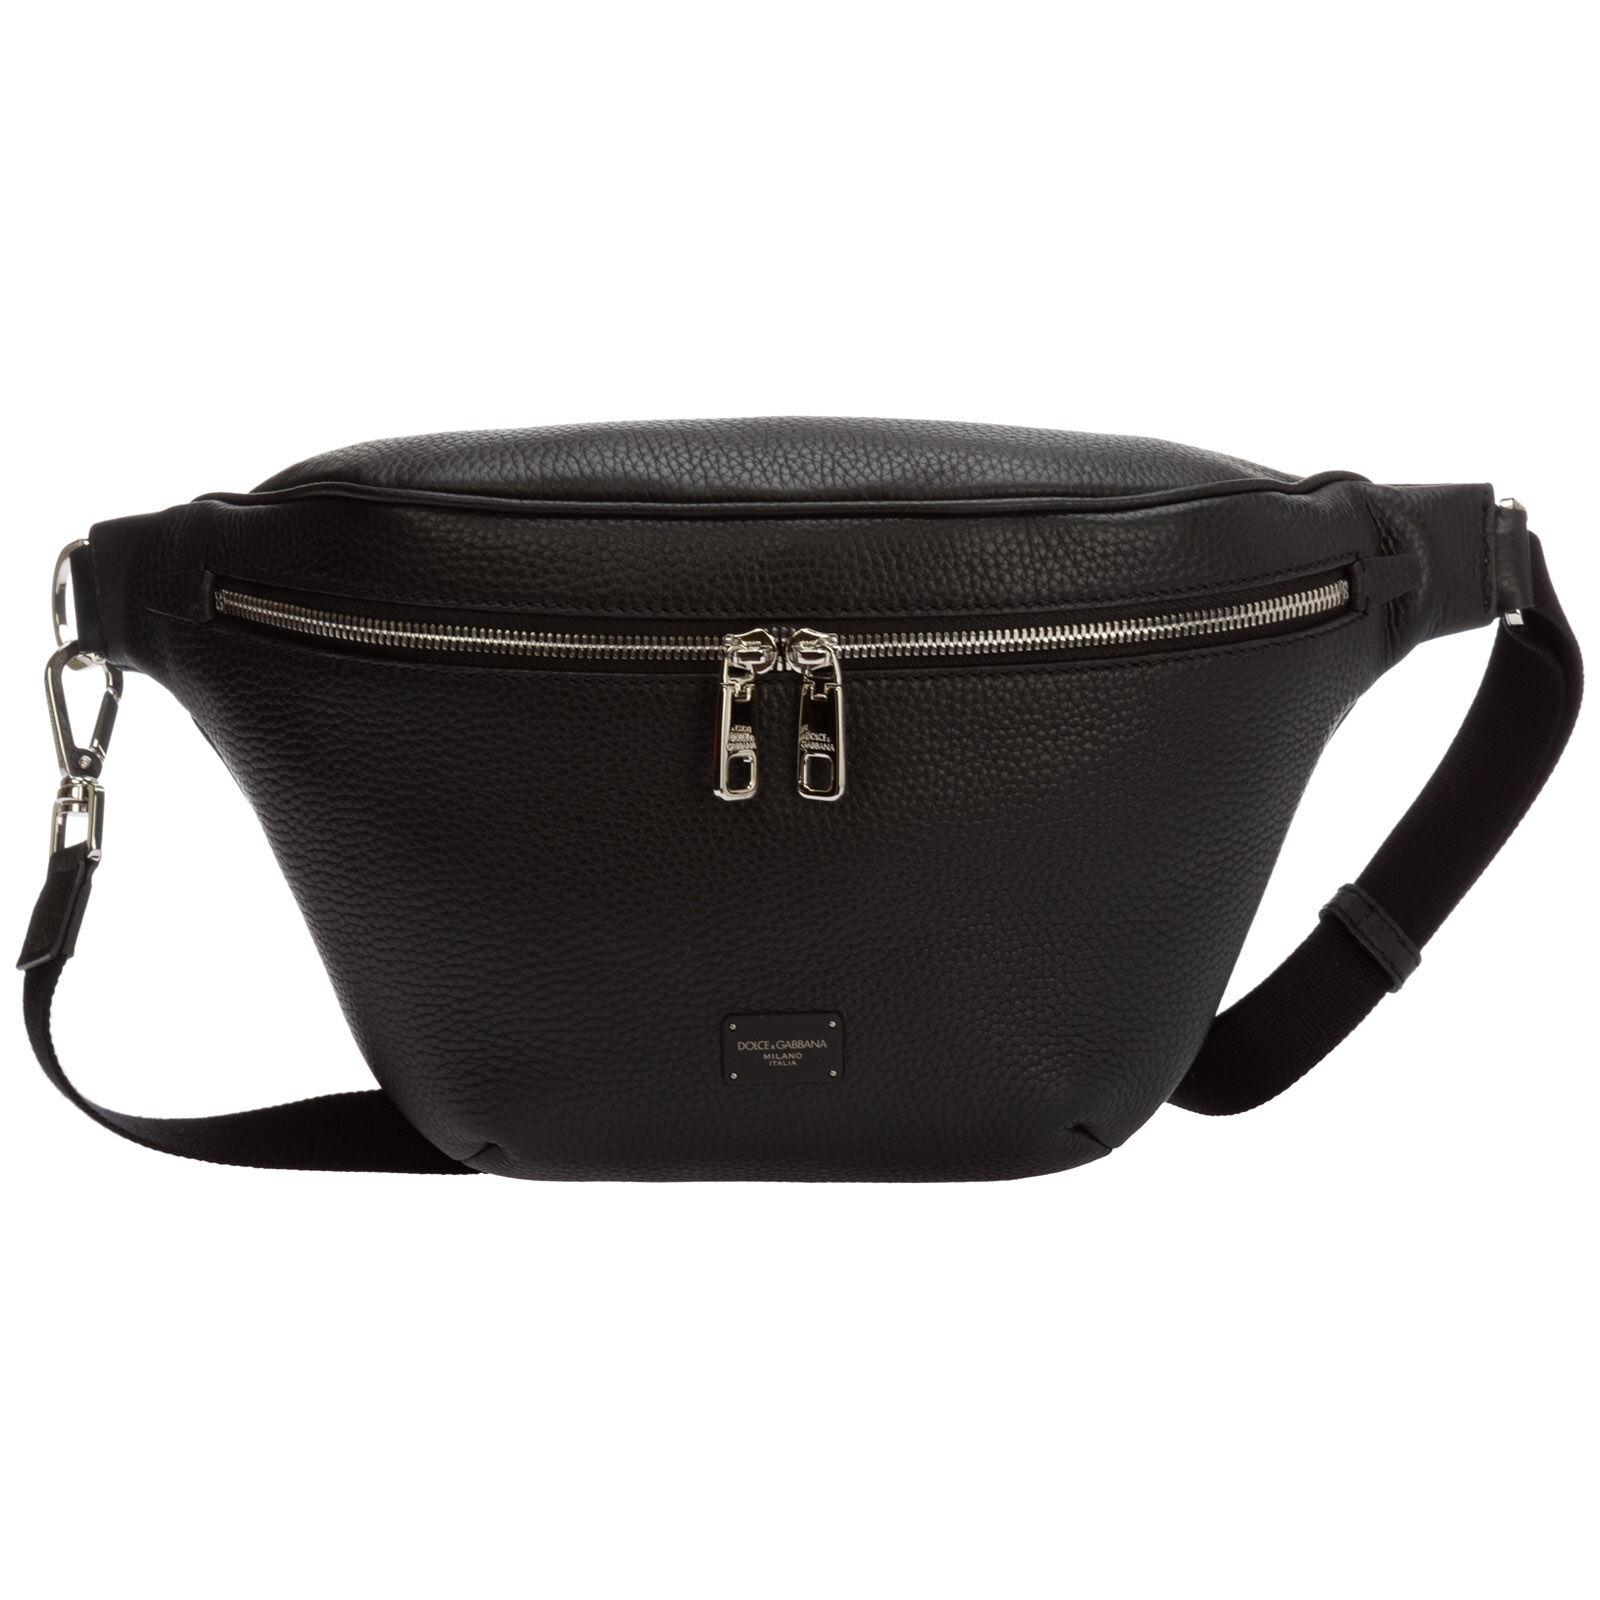 Dolce&Gabbana Men's leather belt bum bag hip pouch  - Black